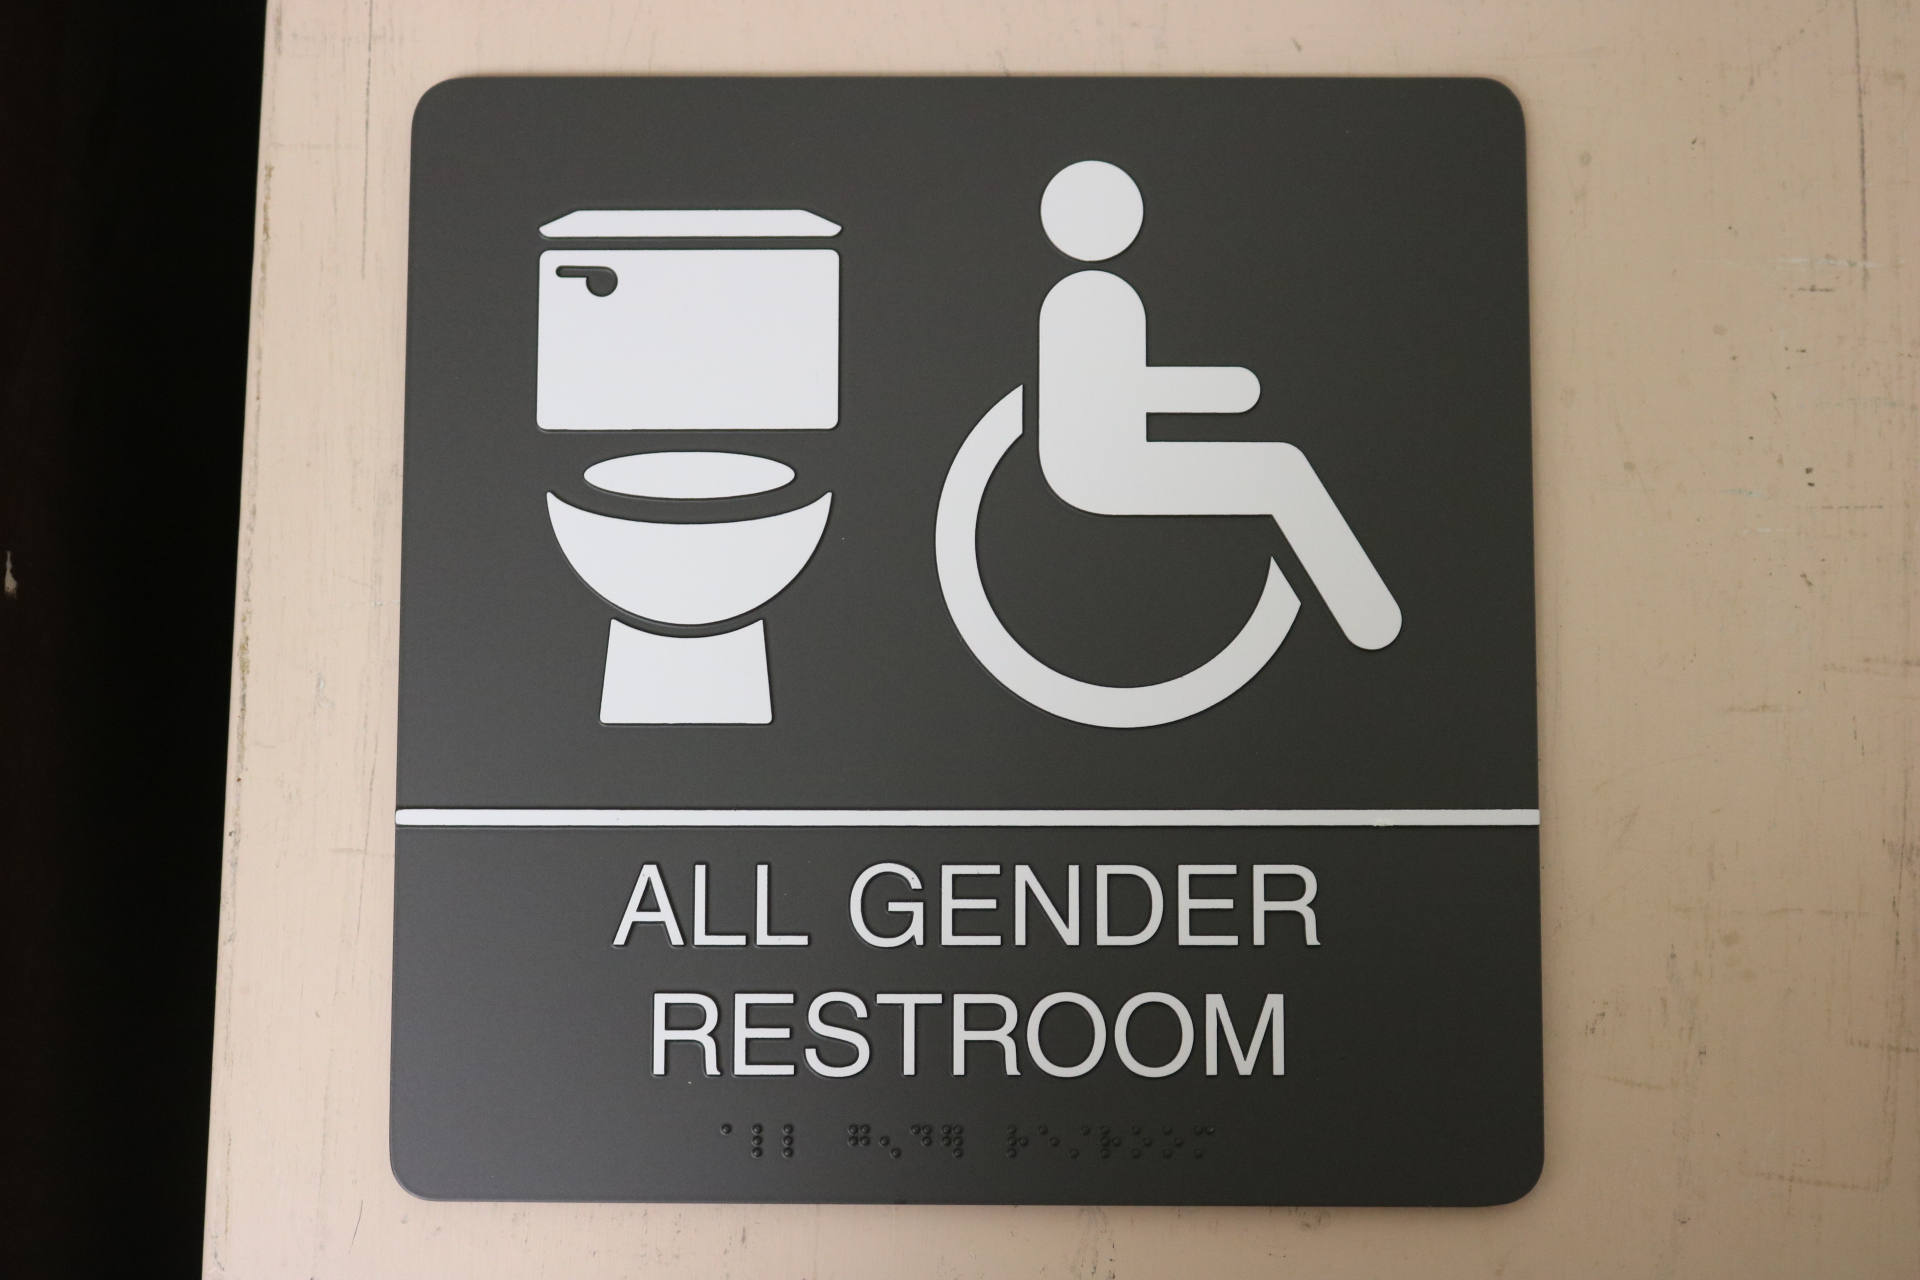 ISU All Gender